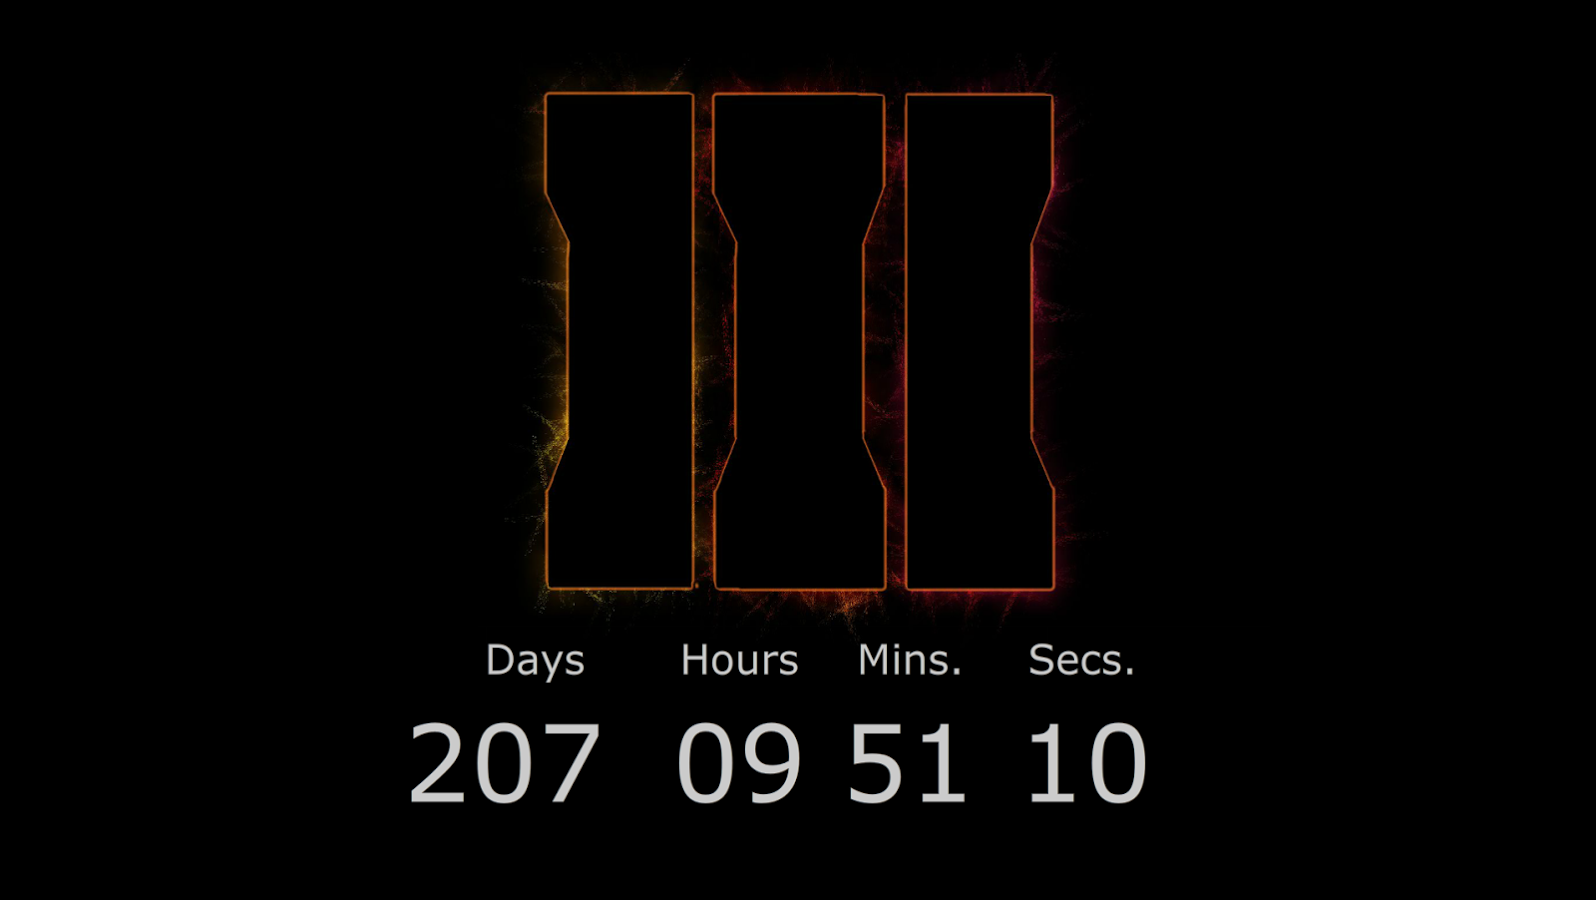 Countdown for Cod Black Ops 3   screenshot 1596x900